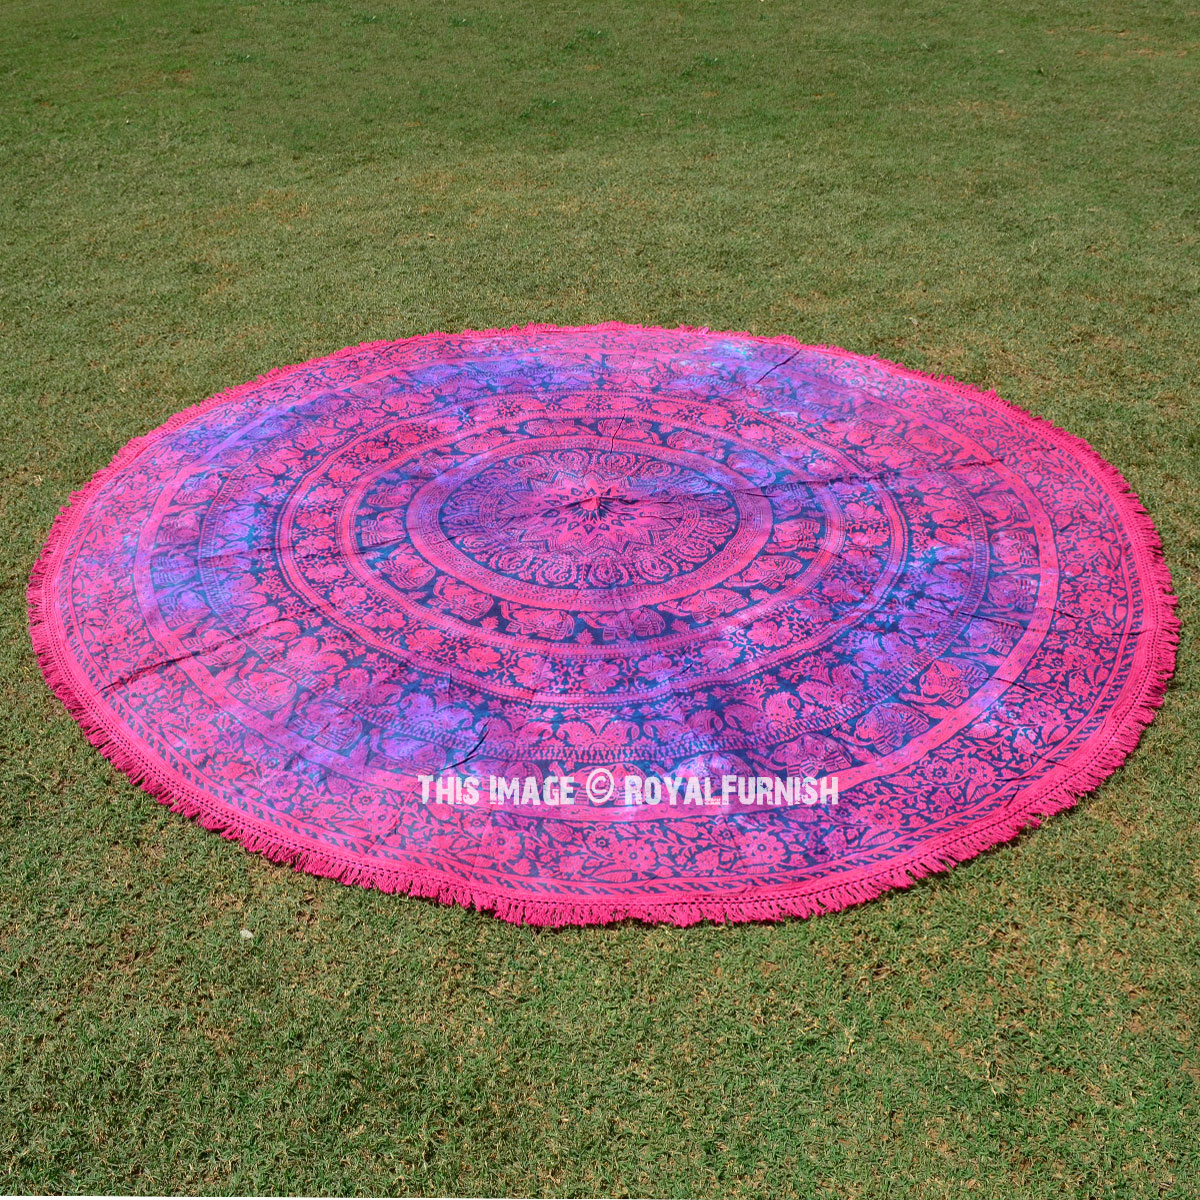 Pink Elephant String Medallion Mandala Roundie Beach Throw